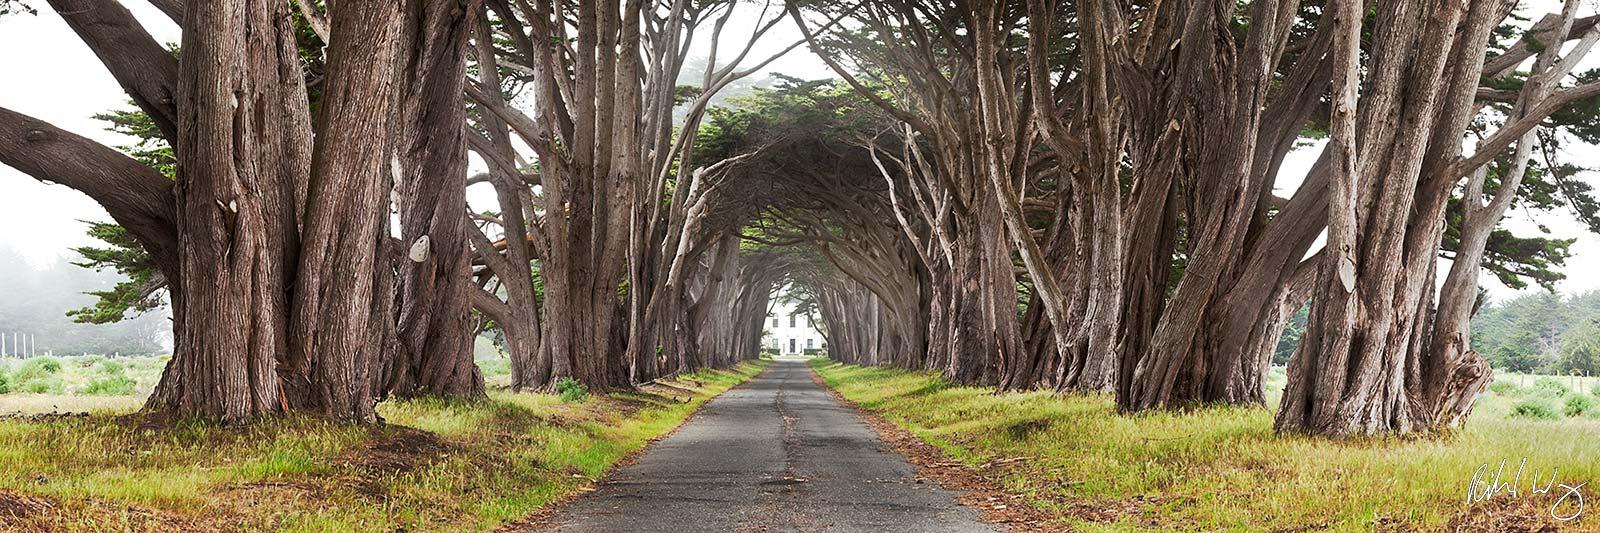 Monterey Cypress Tree Tunnel Panoramic Photo, Point Reyes National Seashore, California, photo, photo